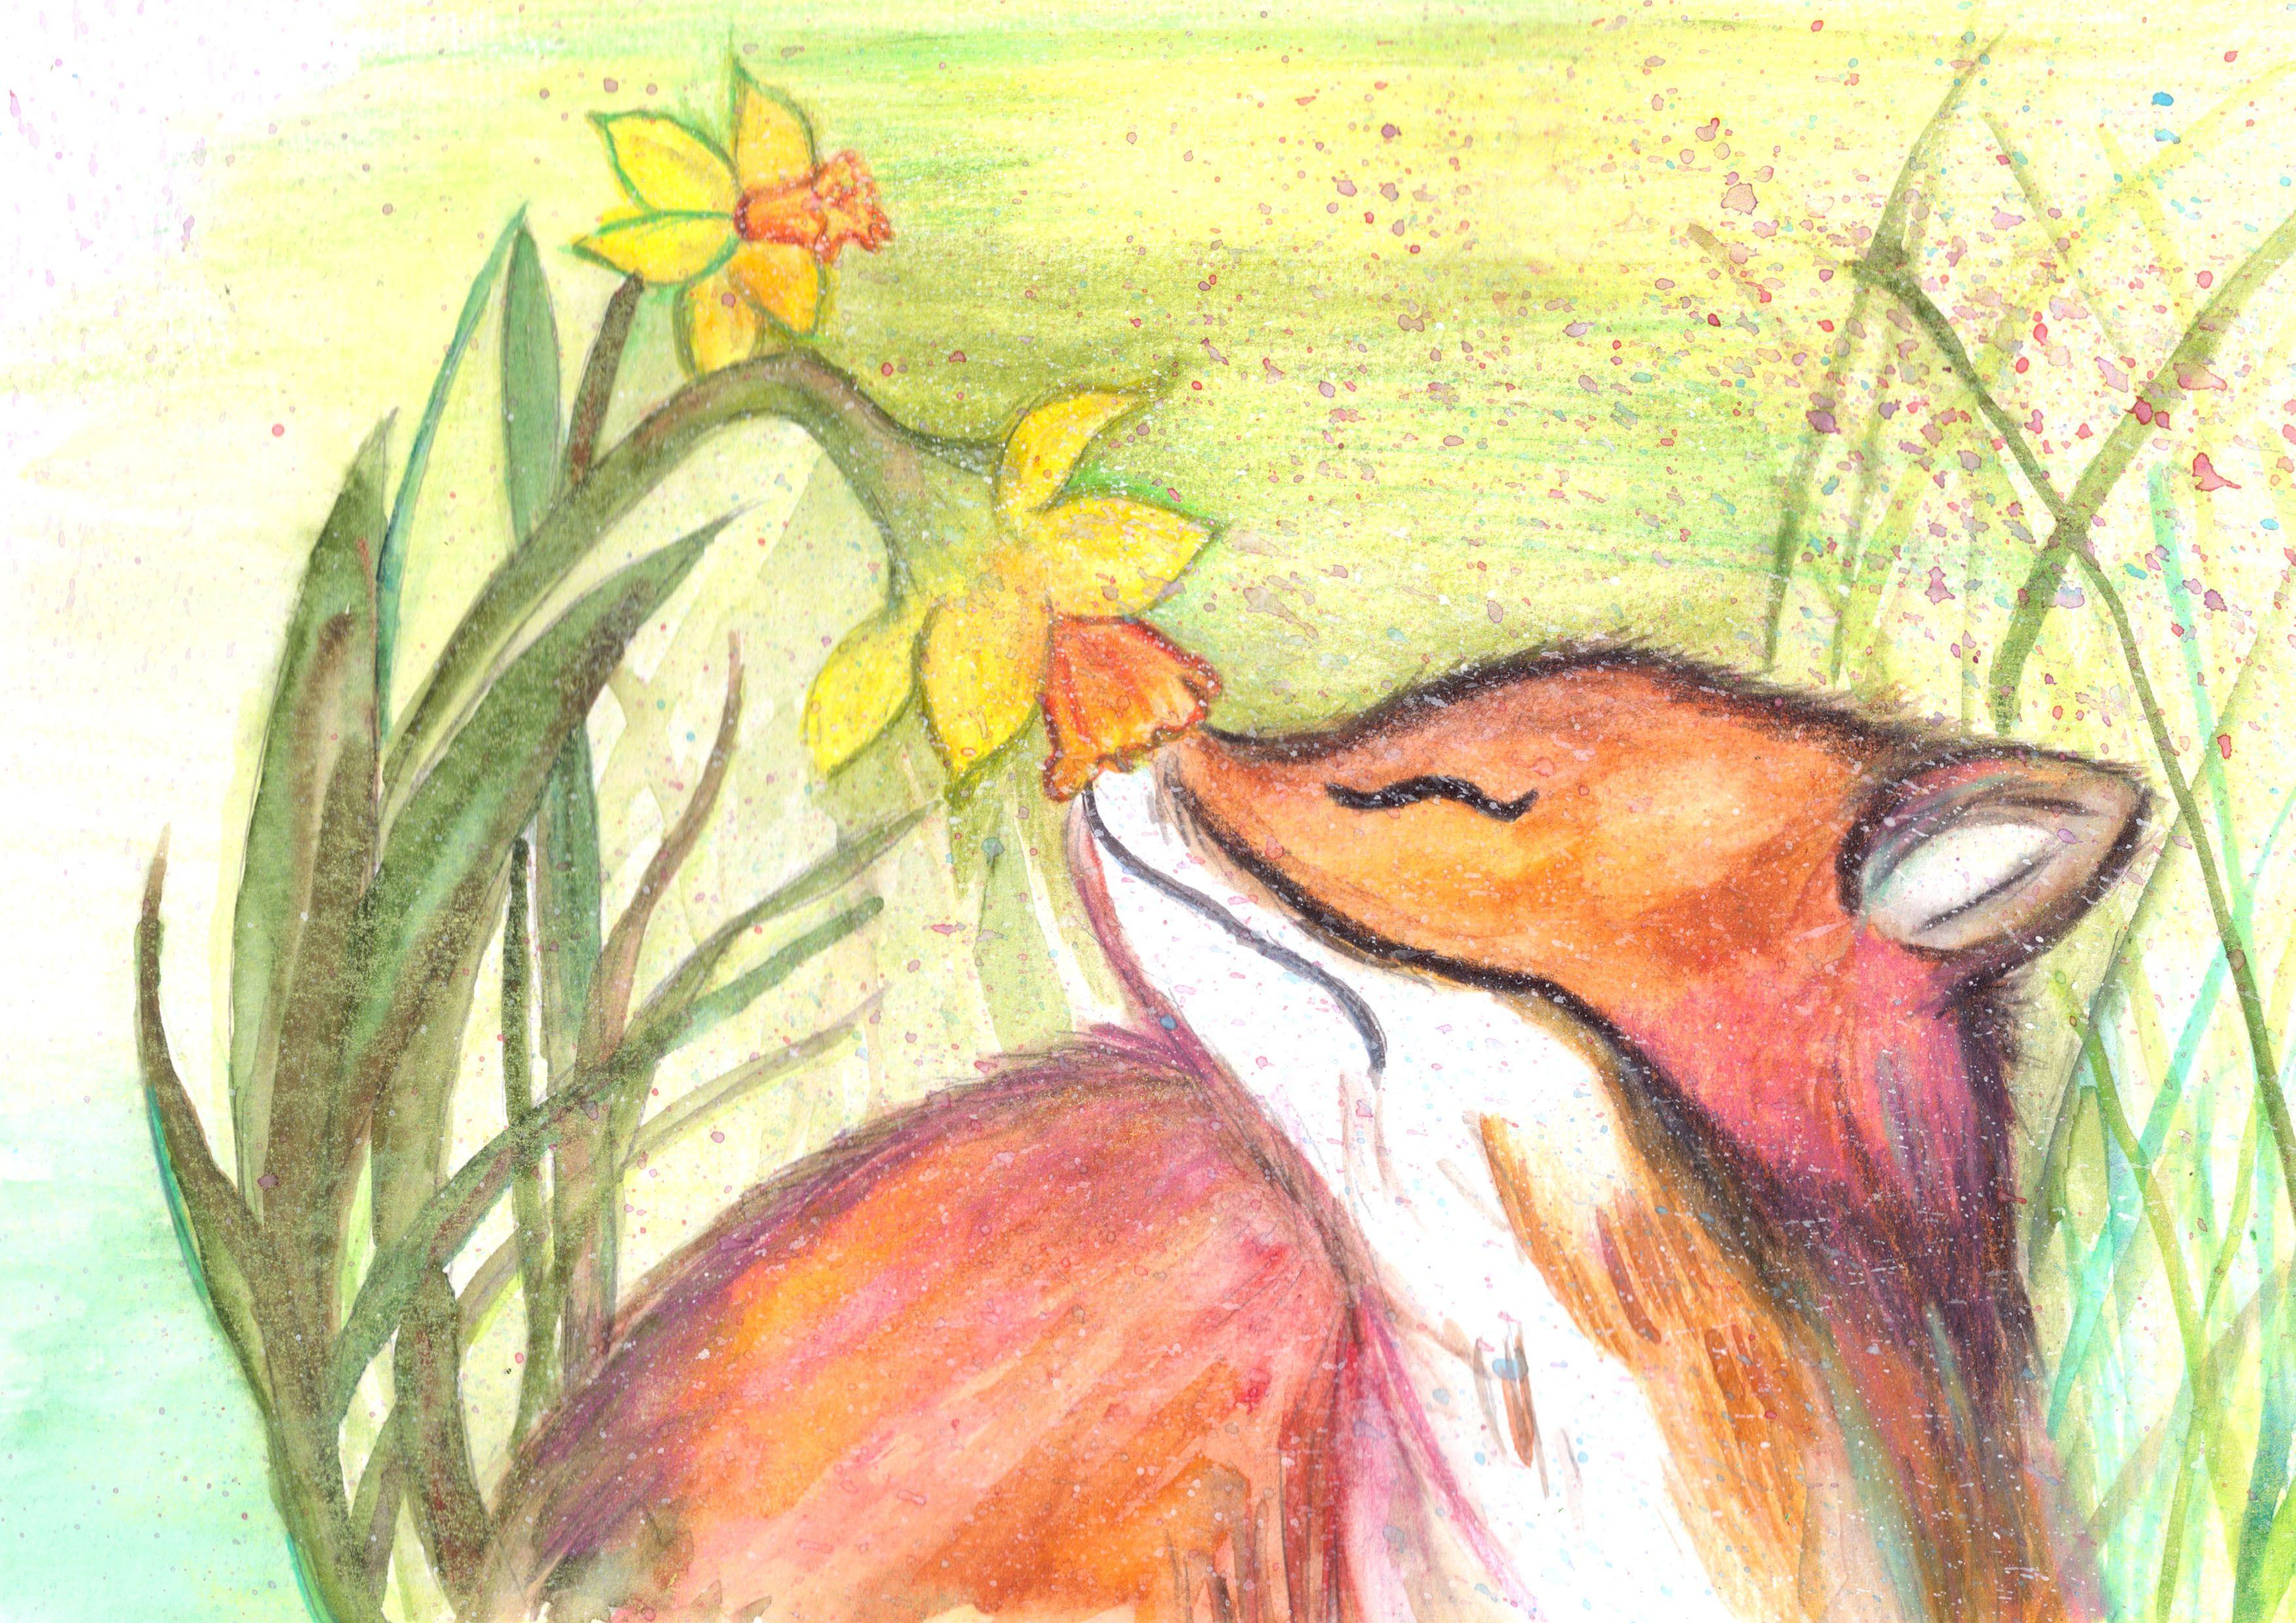 Grain rain red fox and daffodil inspiration by matt in flickr